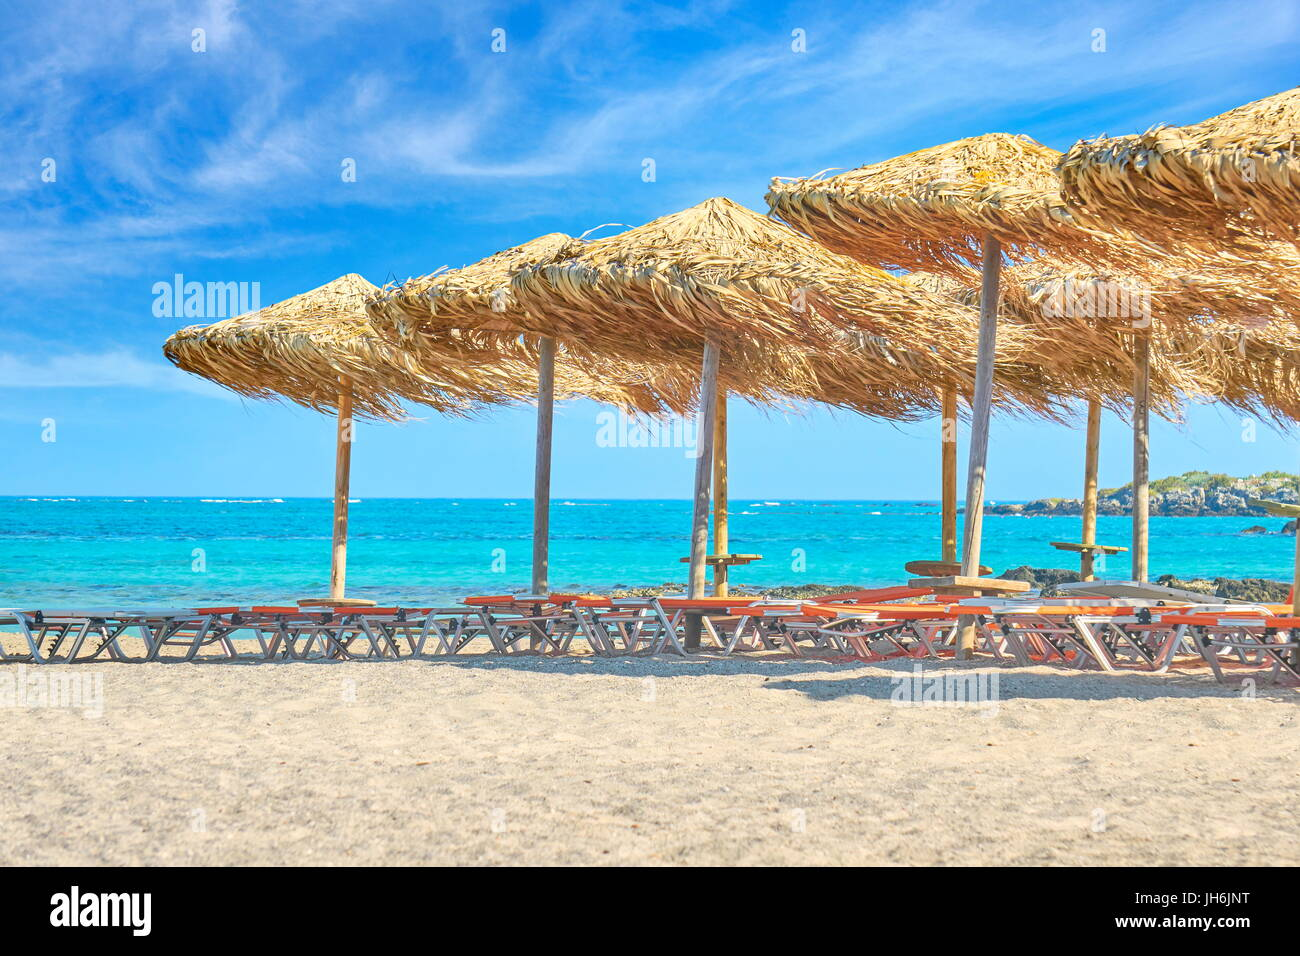 Elafonissi Beach, Crete Island, Greece - Stock Image